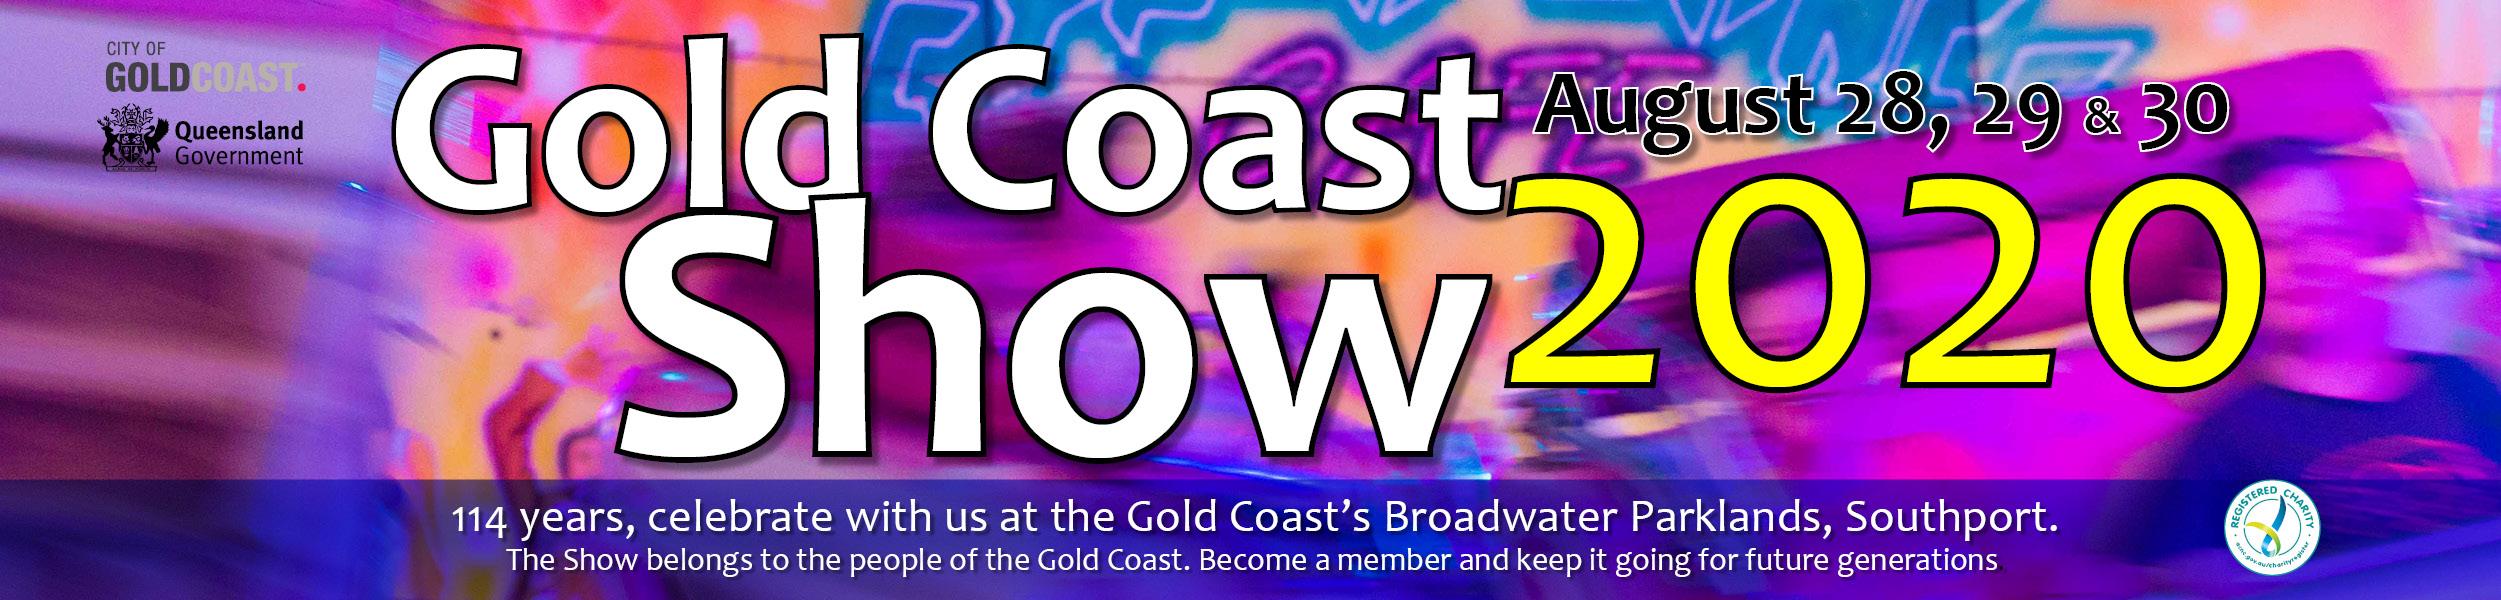 gold coast show